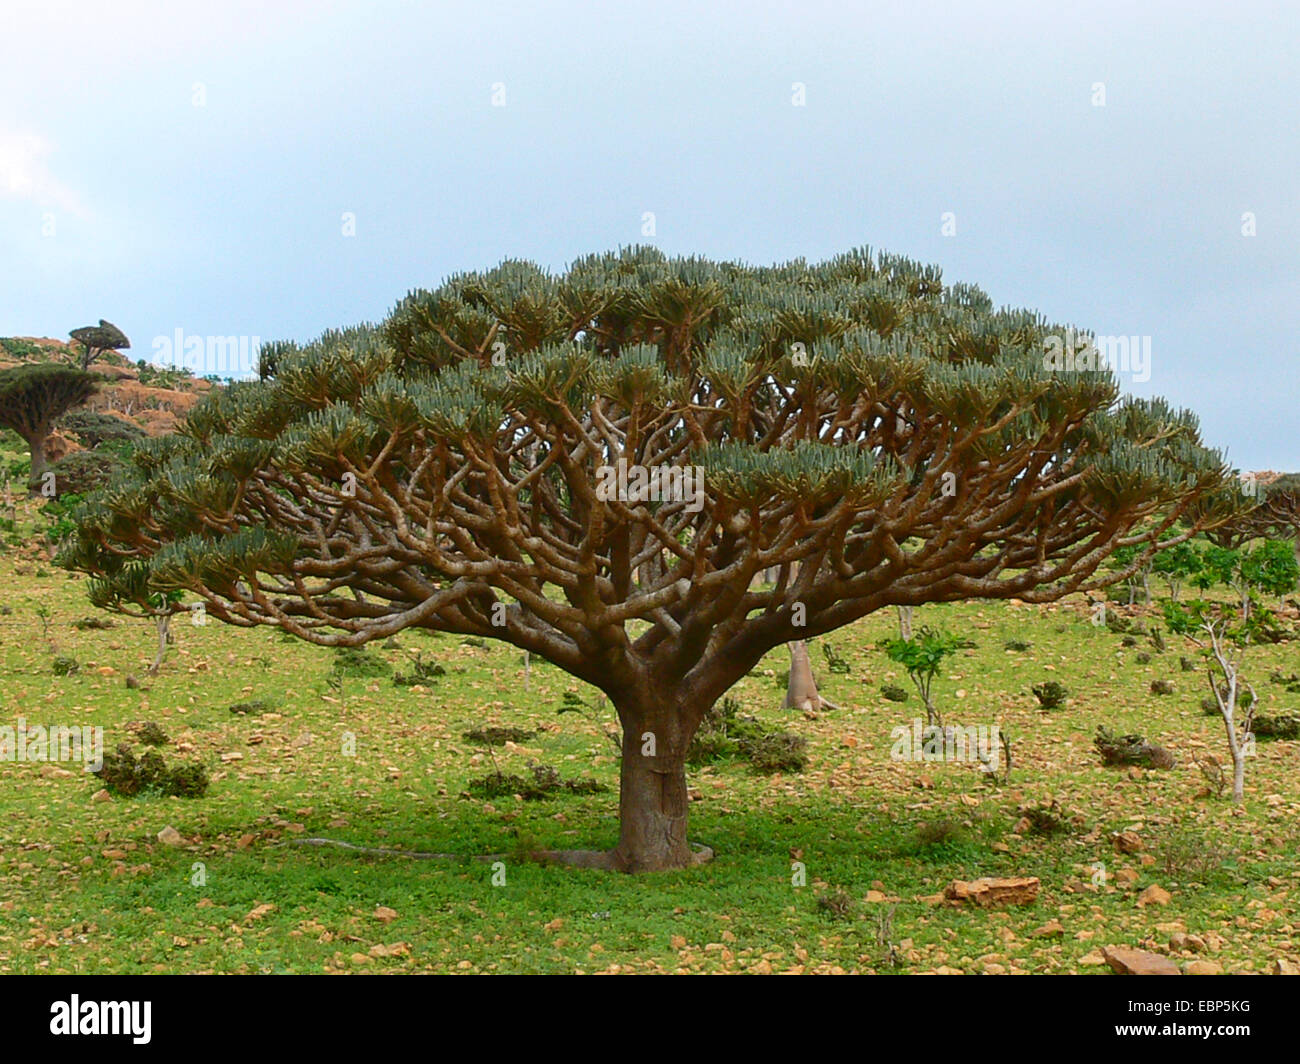 Spurge (Euphorbia arbuscula), endemic to Yemen, Yemen, Socotra - Stock Image